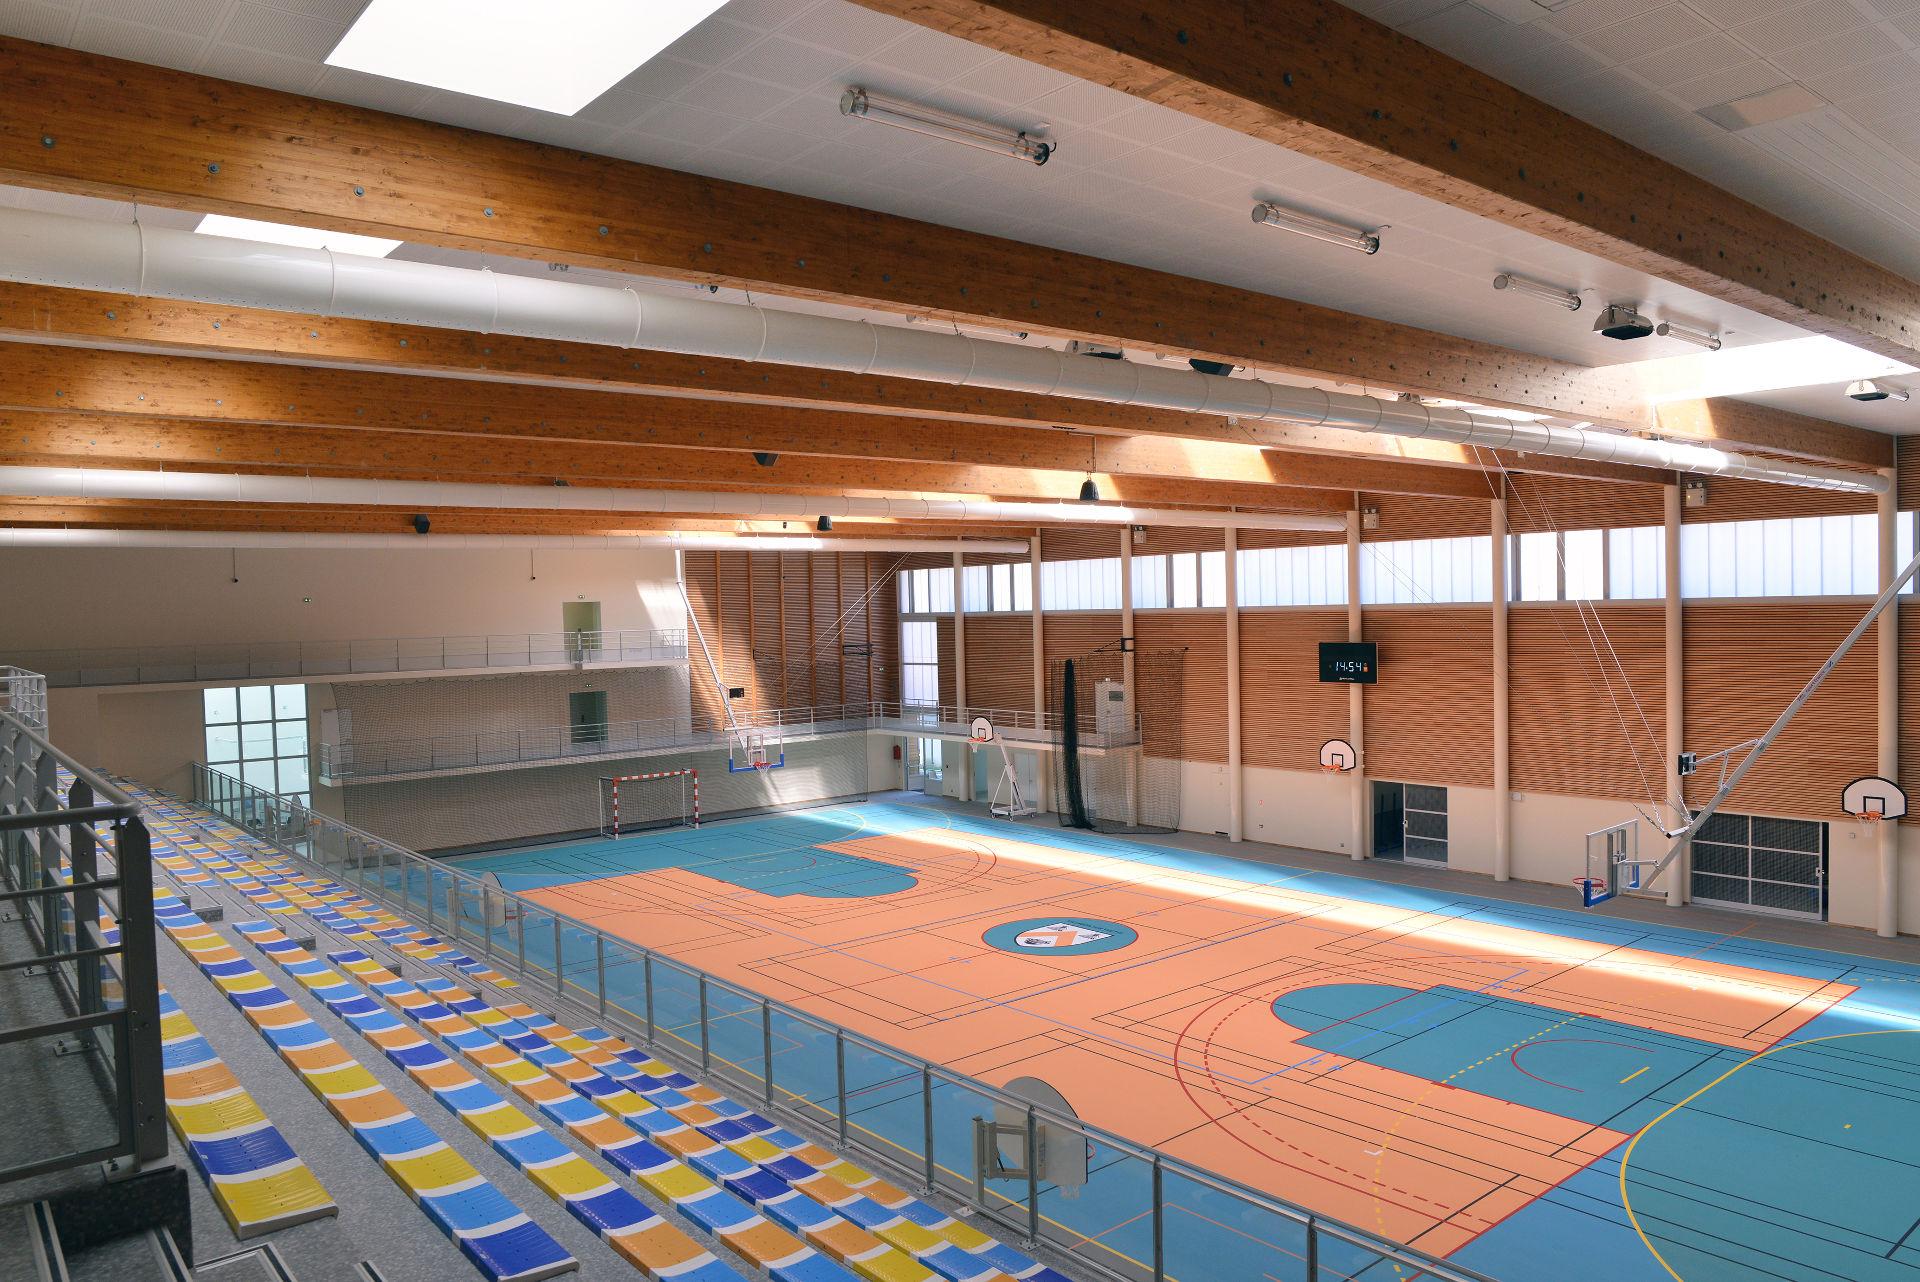 Terrain multisport gymnase Villebon sur Yvette